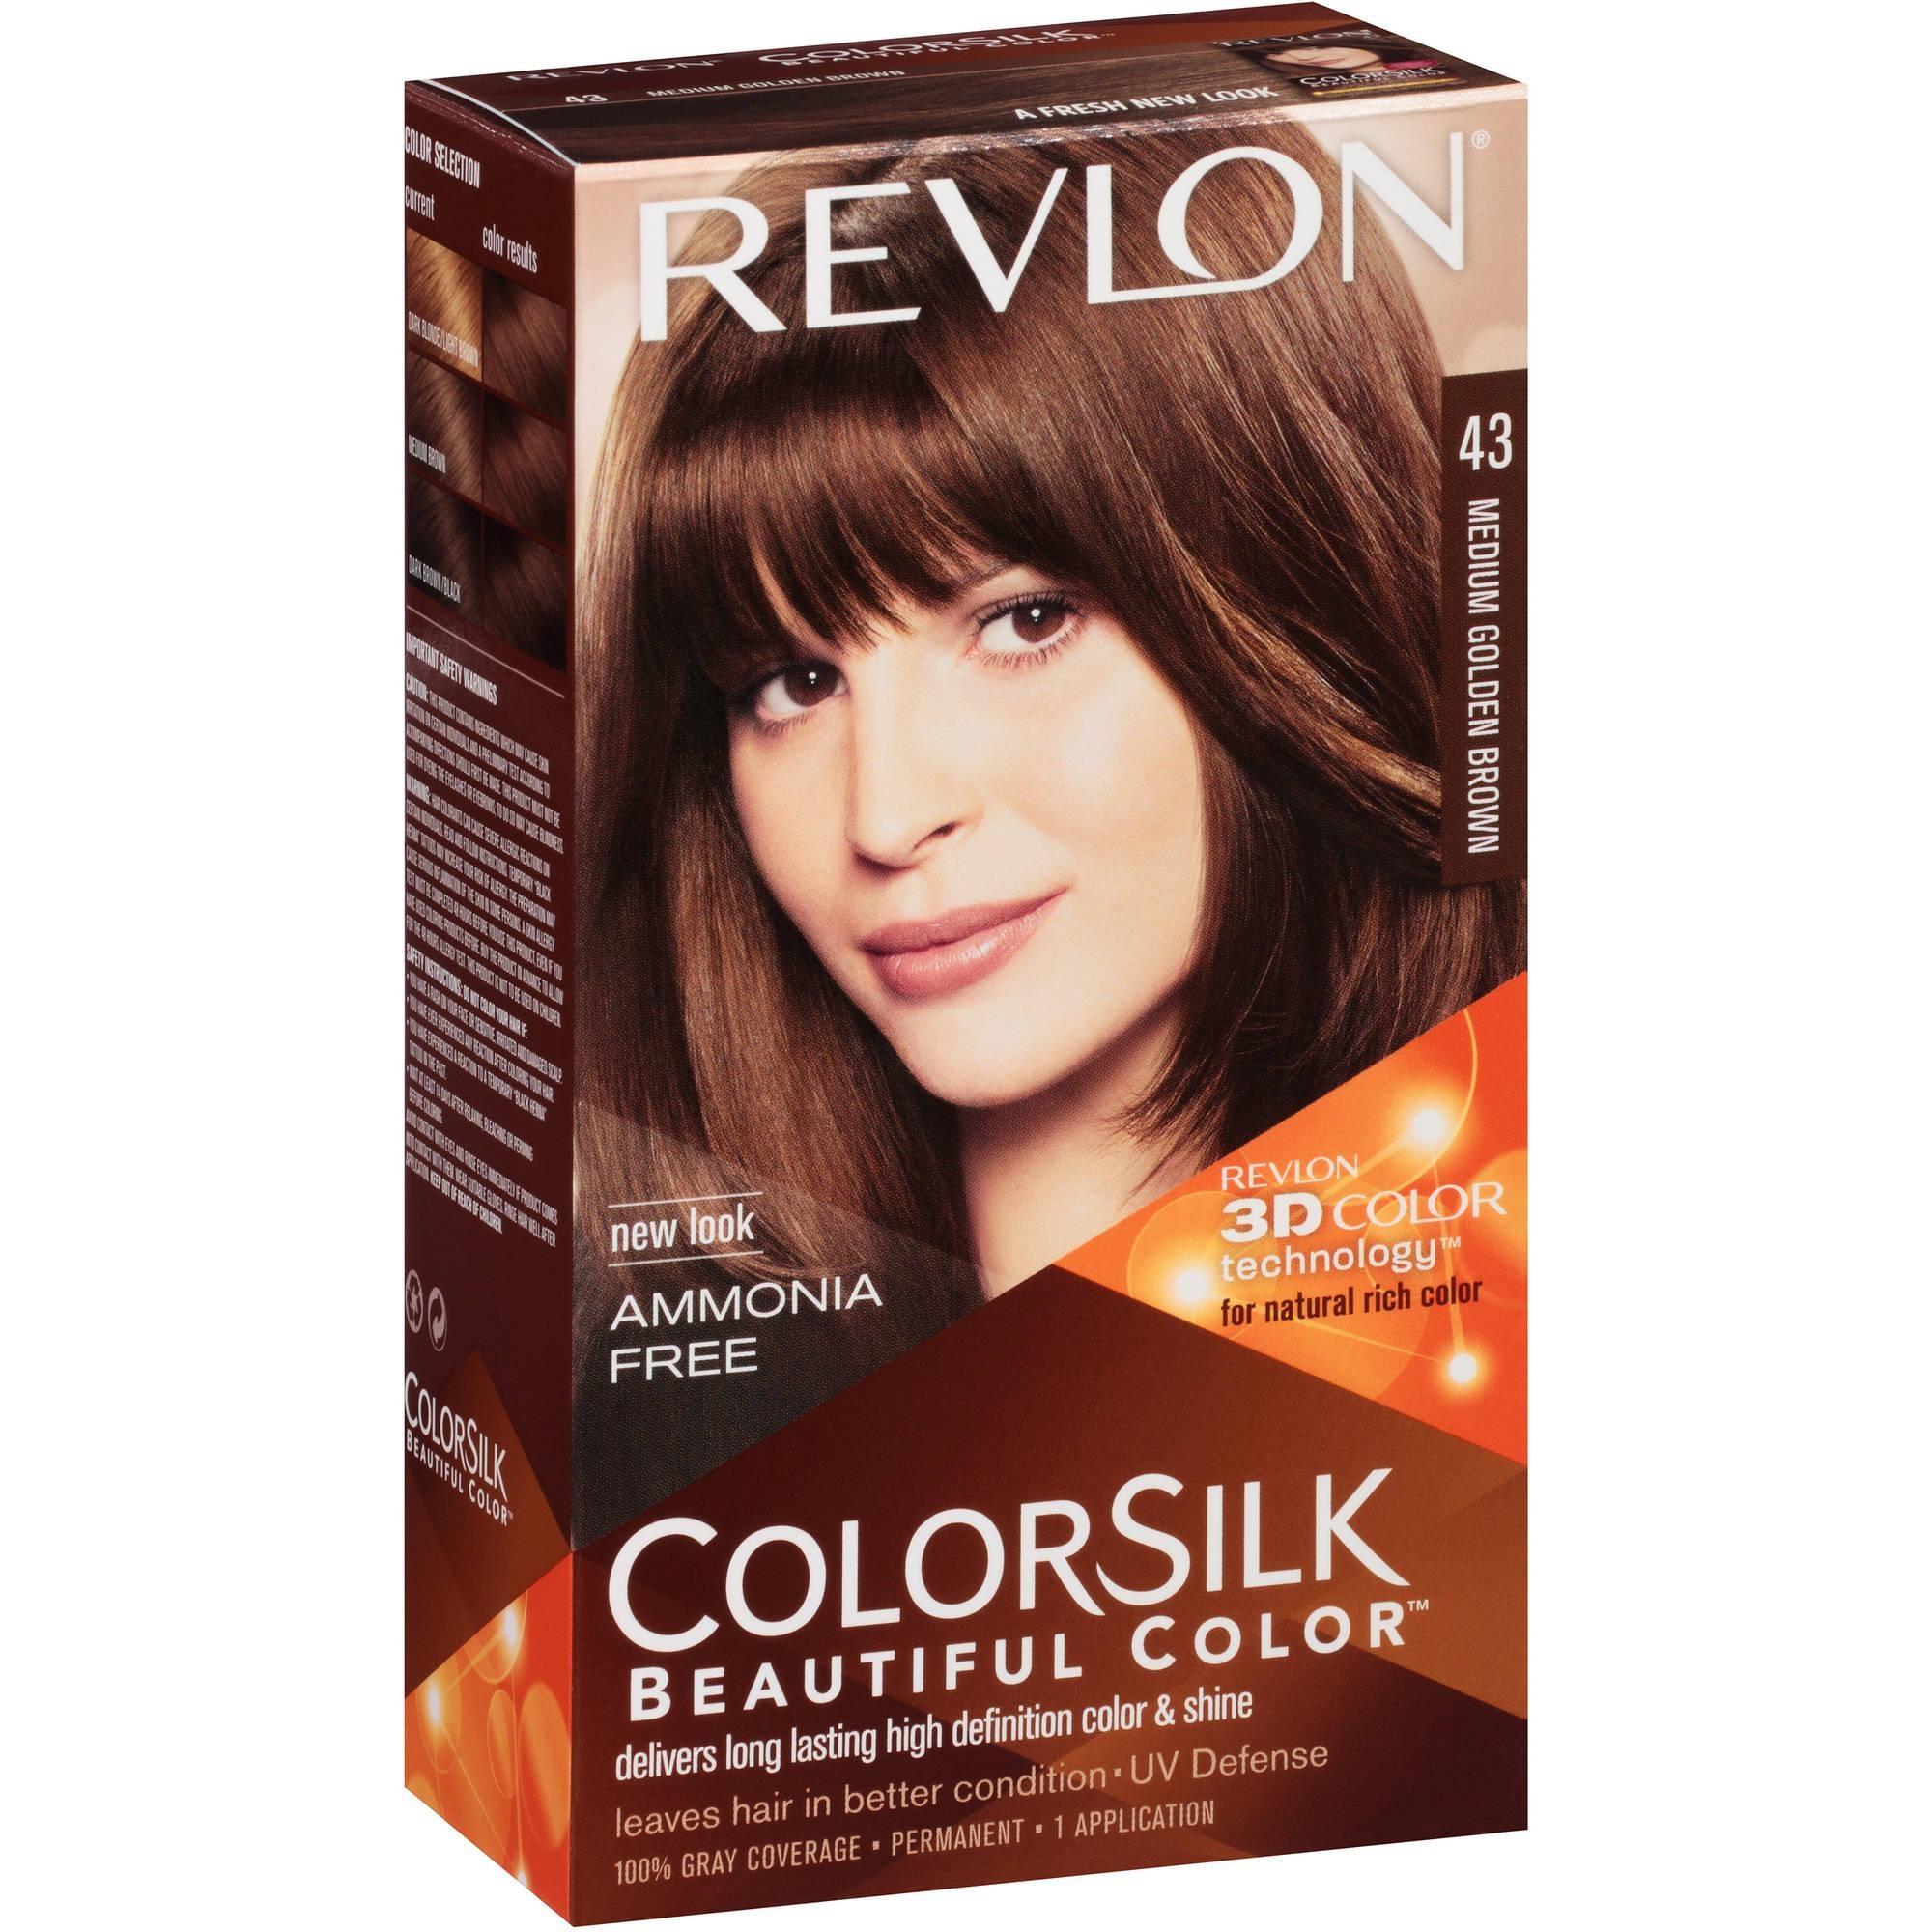 revlon colorsilk hair color 43 medium golden brown